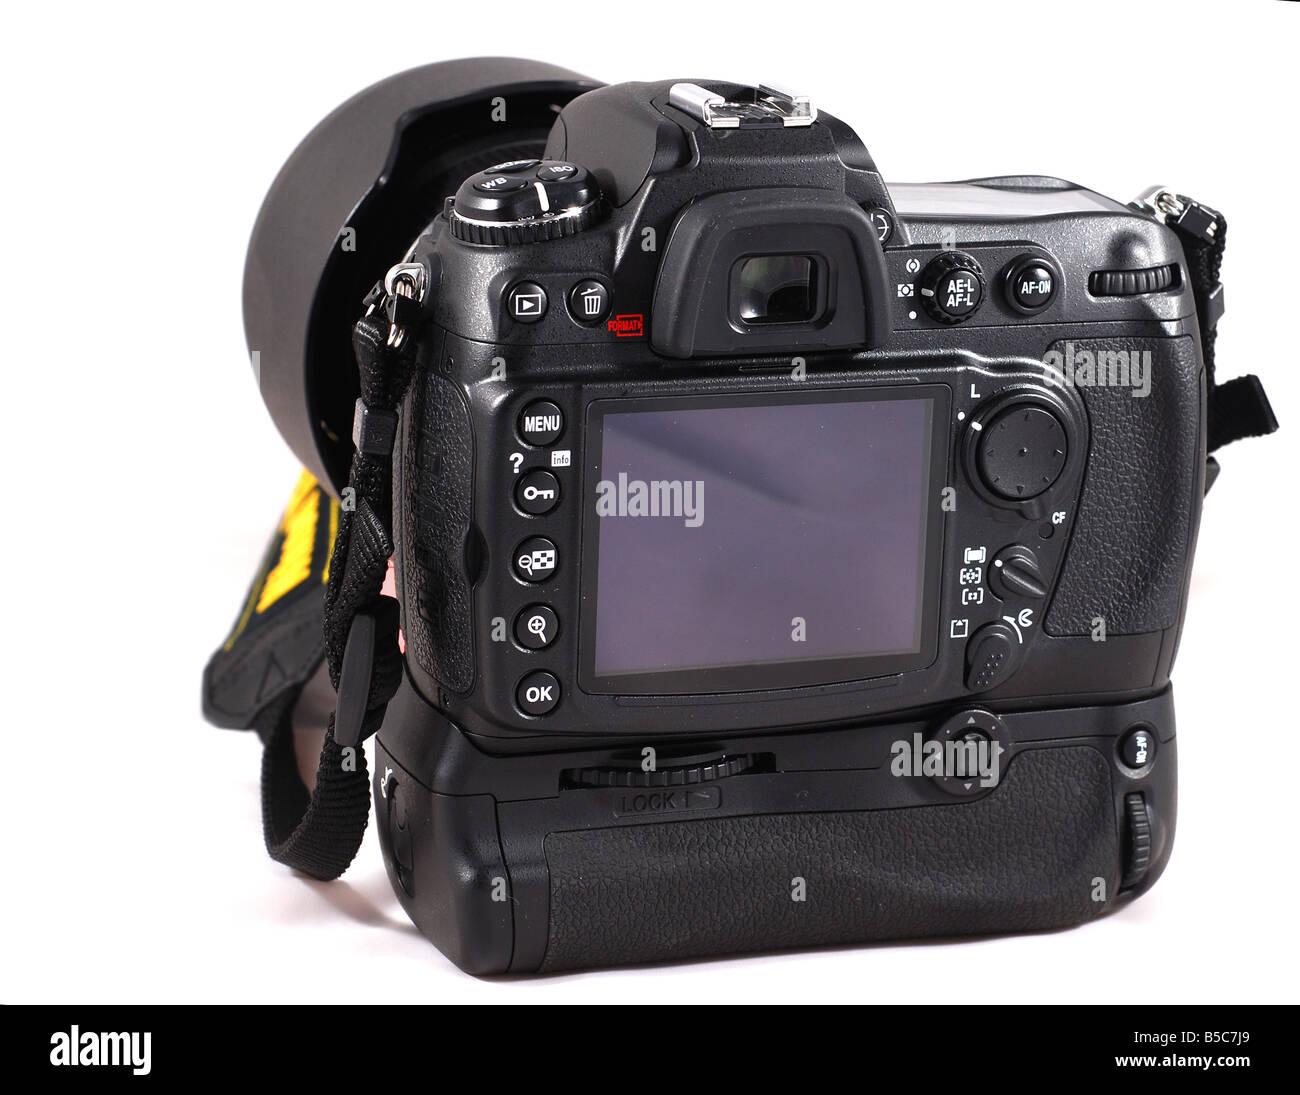 Nikon D300 with MB-D10 battery grip - Stock Image